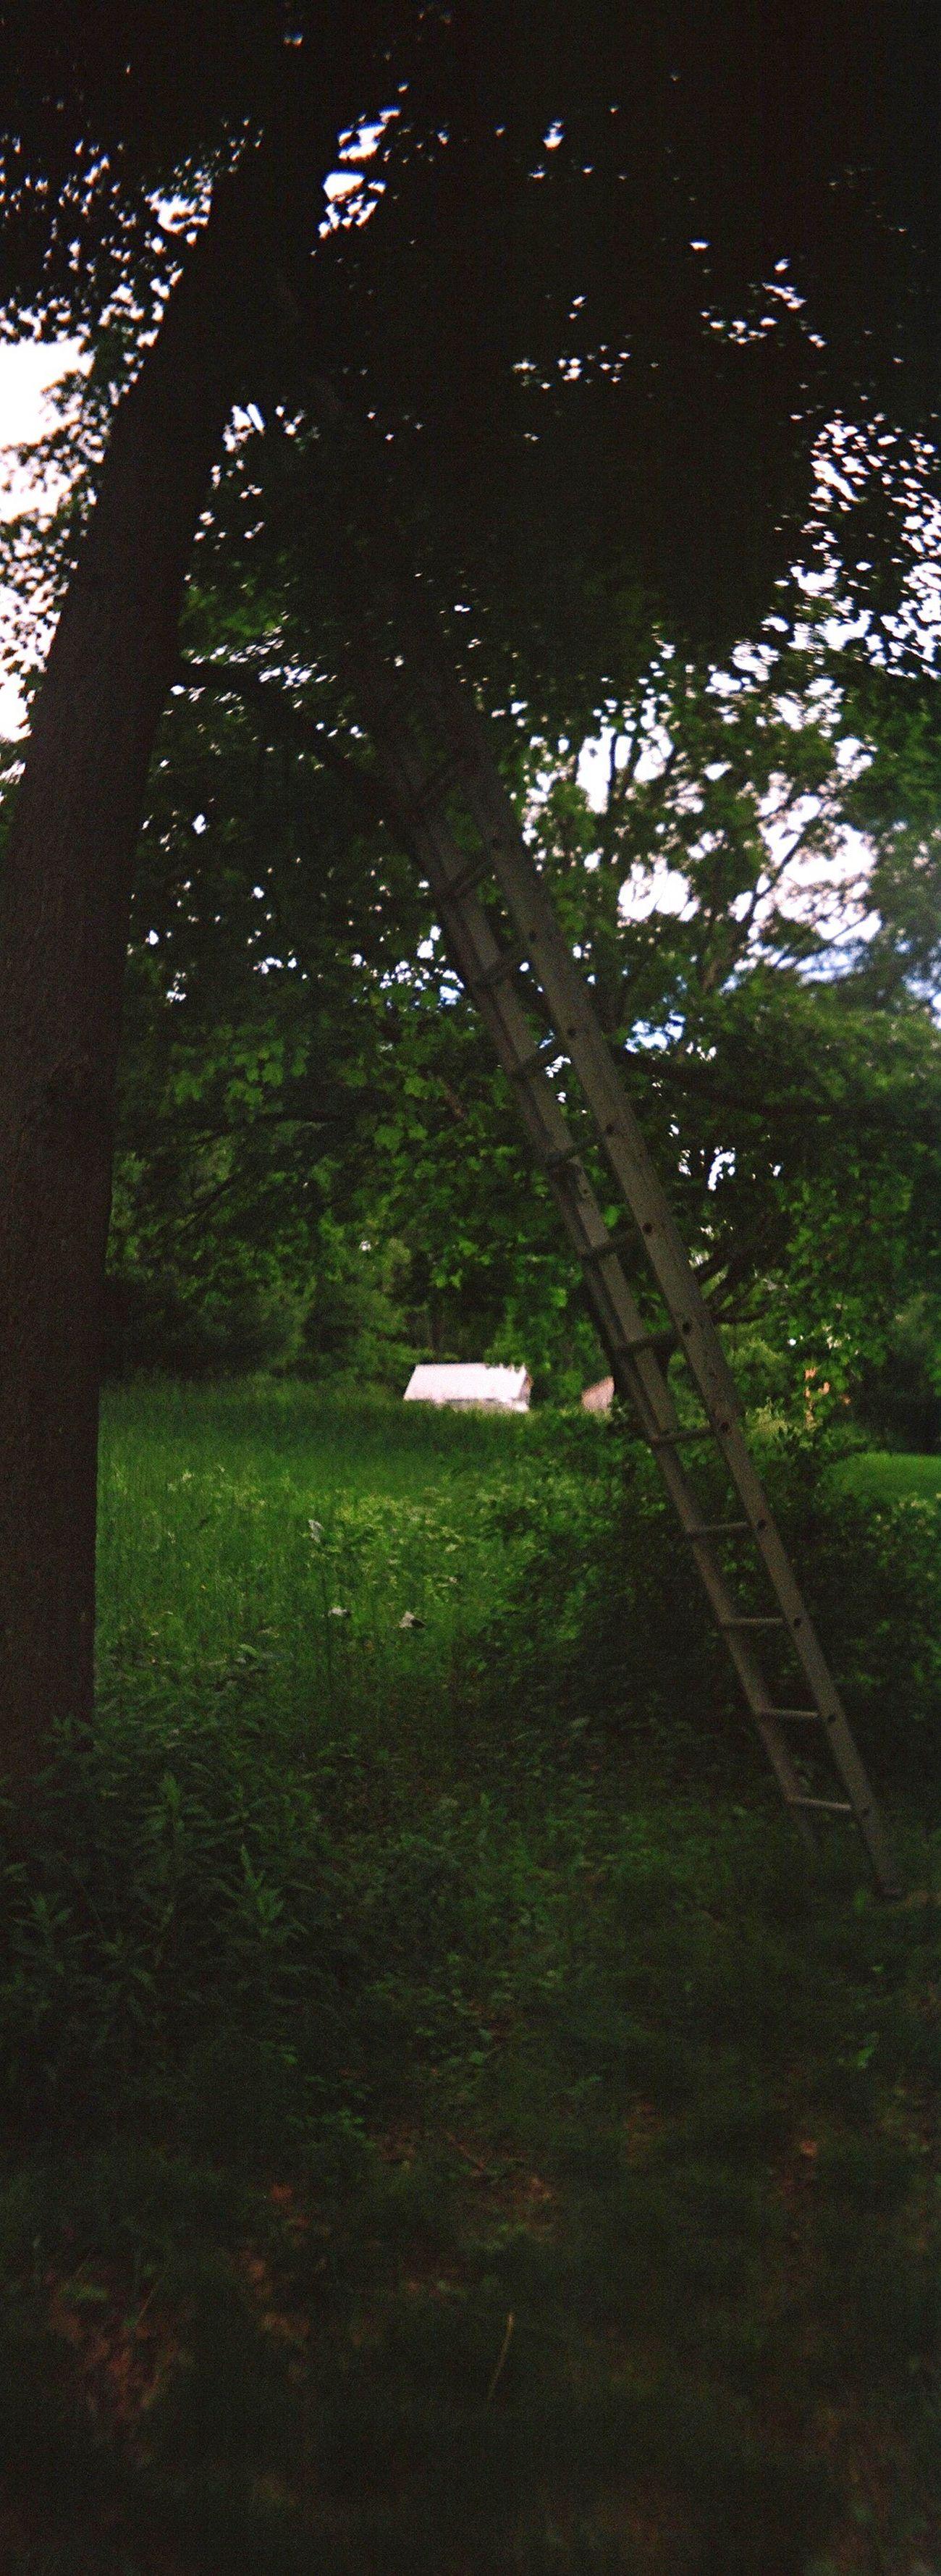 Grass Koduckgirl Ladder Tree Climb Film Sprocket Rocket Panorama Country Life No People